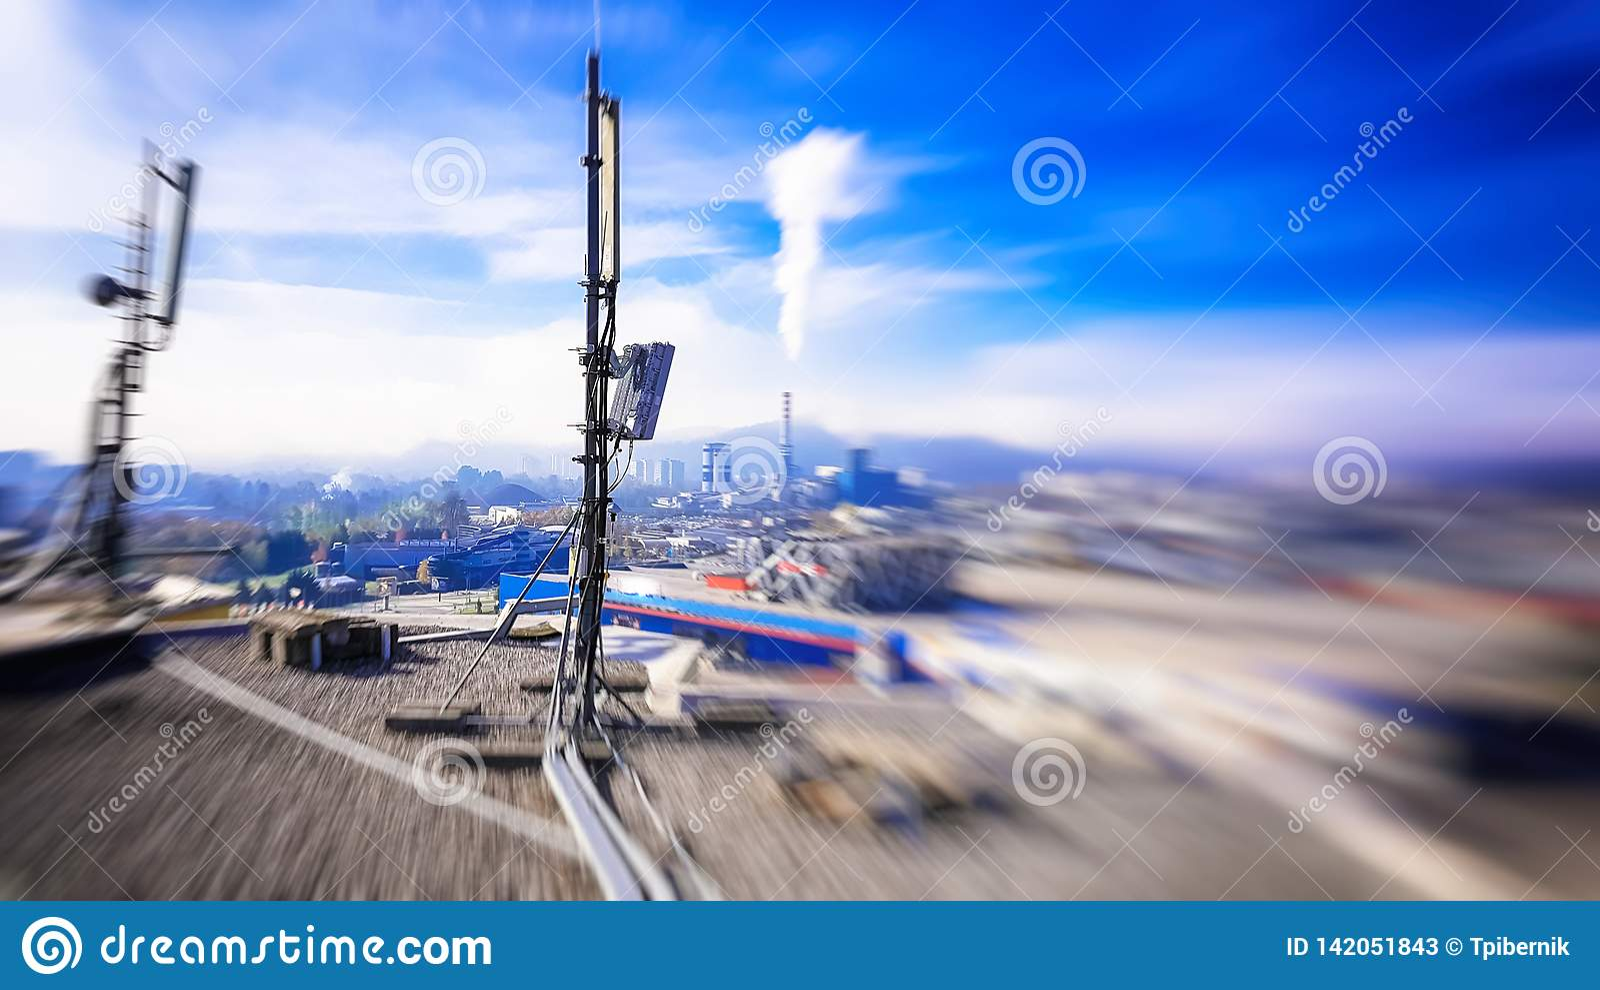 5G Mobile Telecommunication Smart Cellular Radio Network